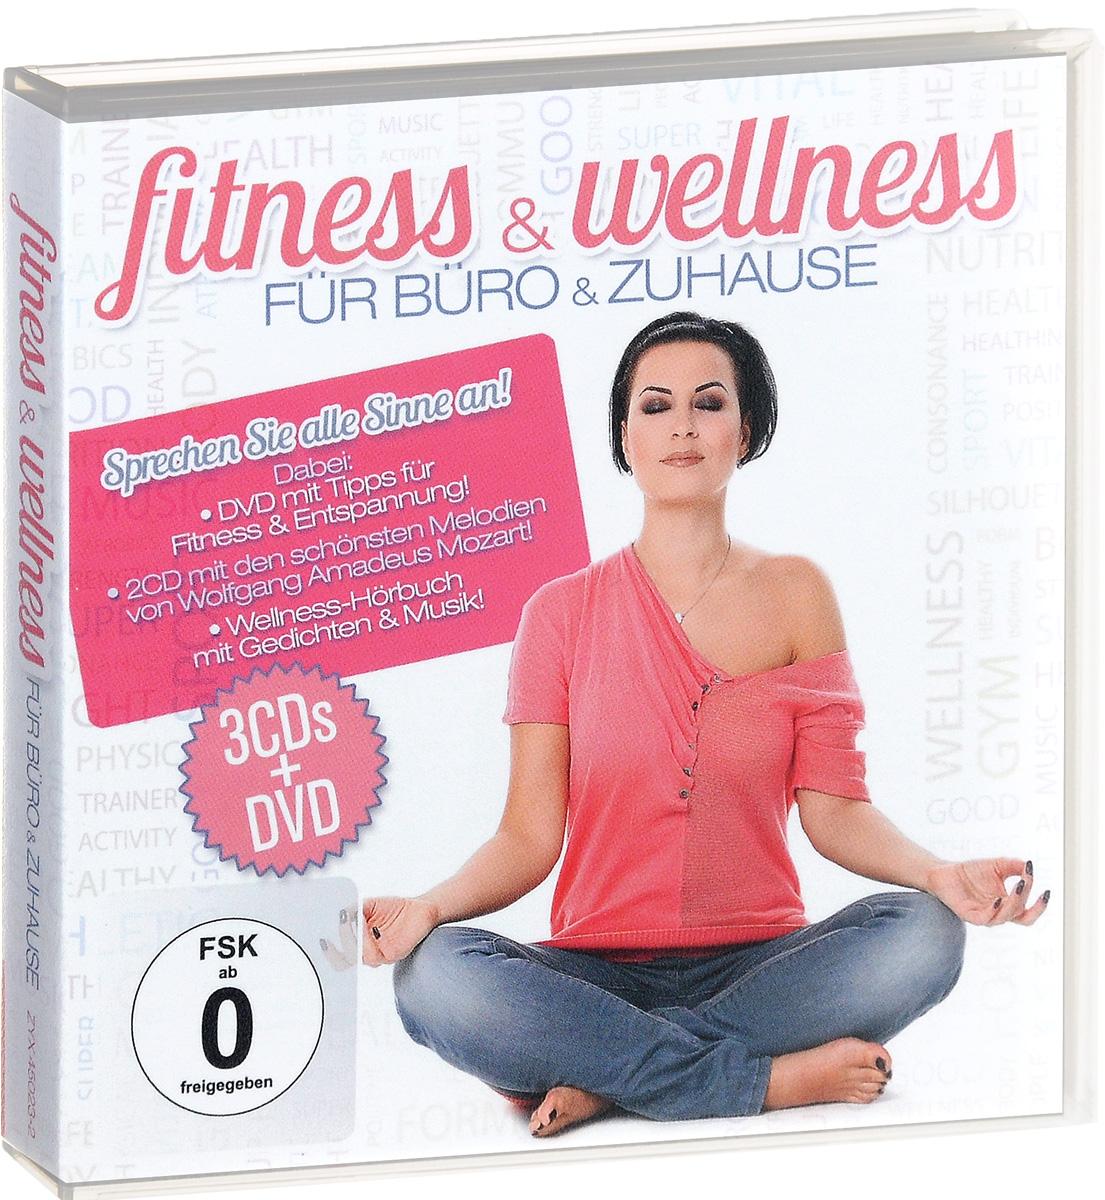 Fitness & Wellness Fur Buro Und Zuhause (3 CD + DVD) гардемарины 3 dvd